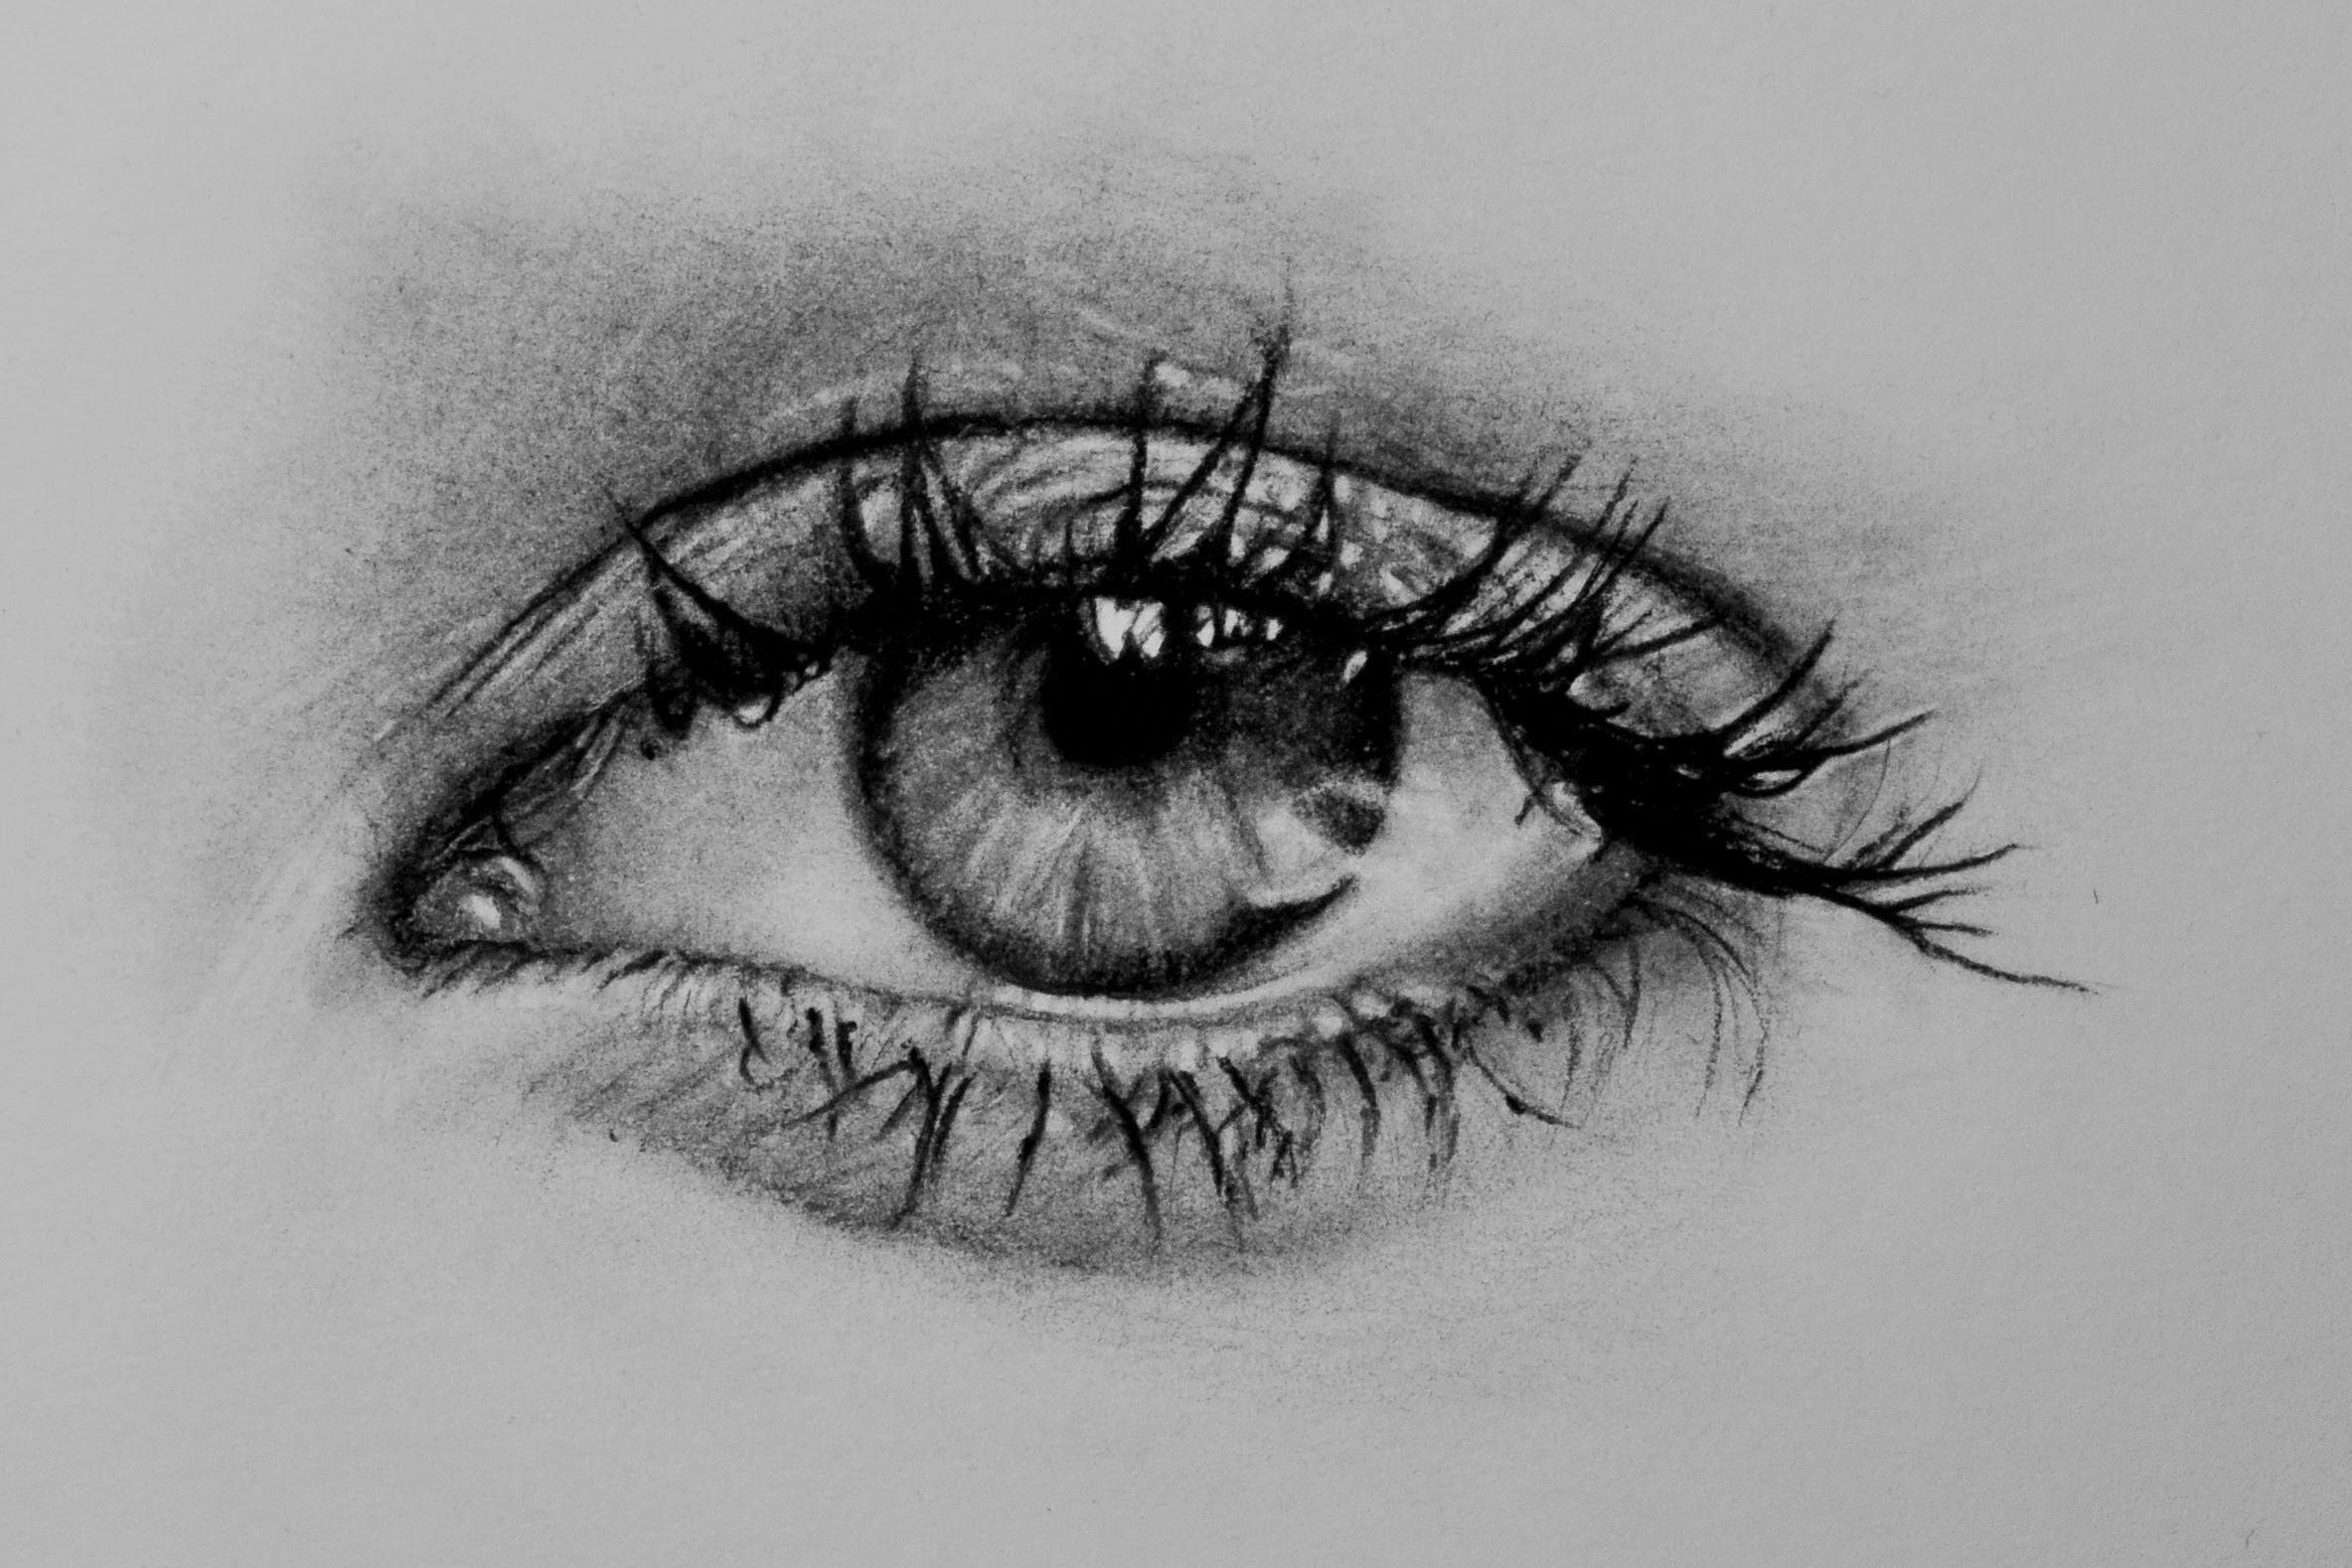 Drawn pen realistic drawing YouTube drawing)  eye (speed